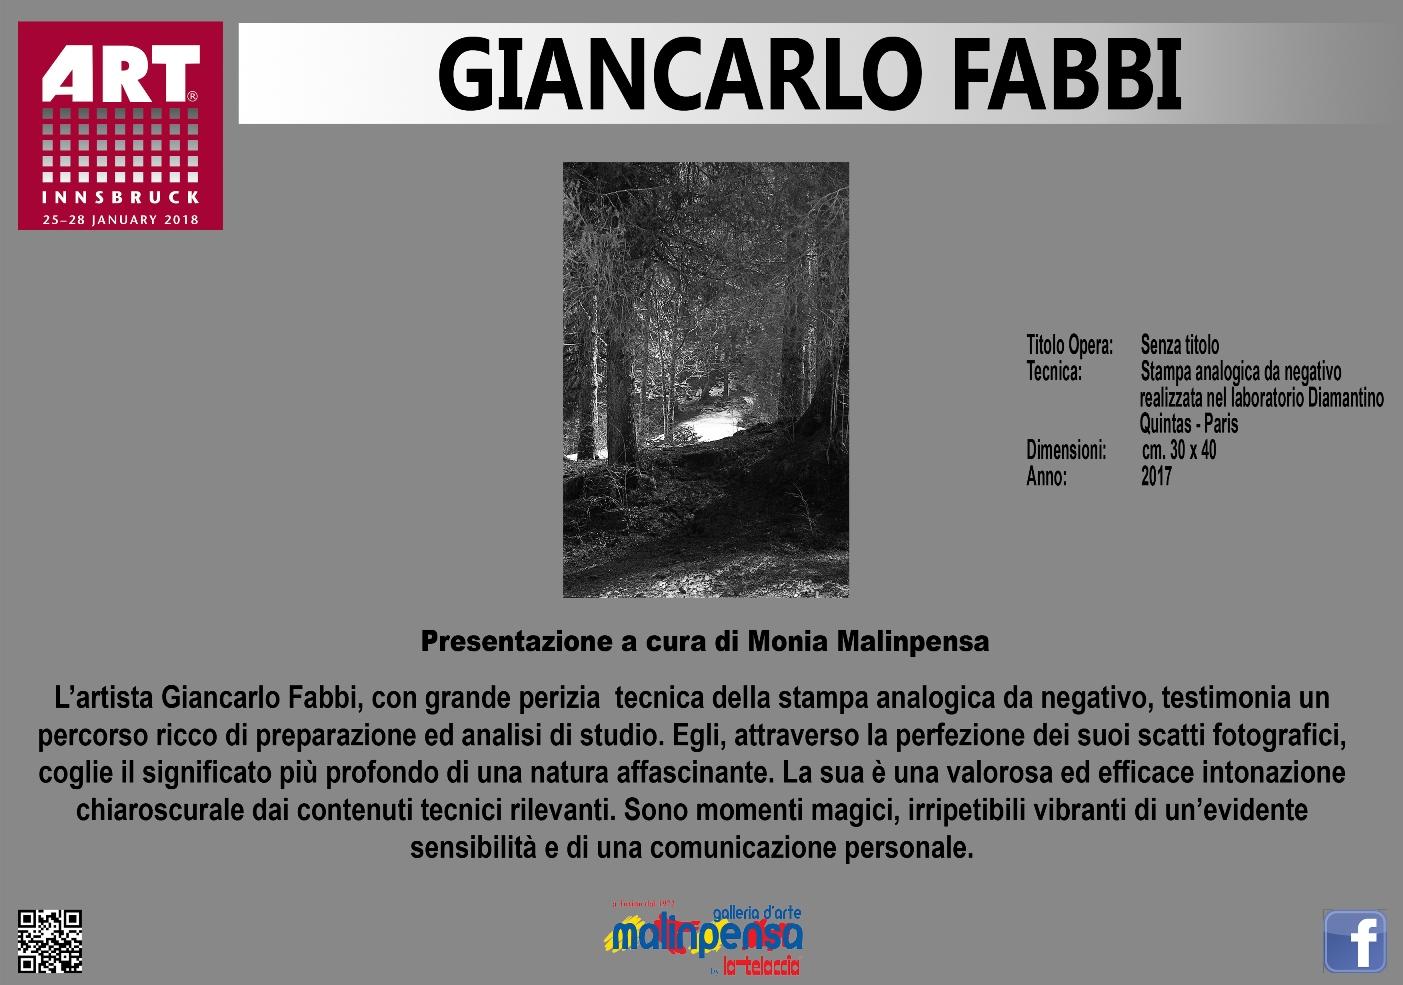 GIANCARLO FABBI_PRESENTAZIONE_c.jpg